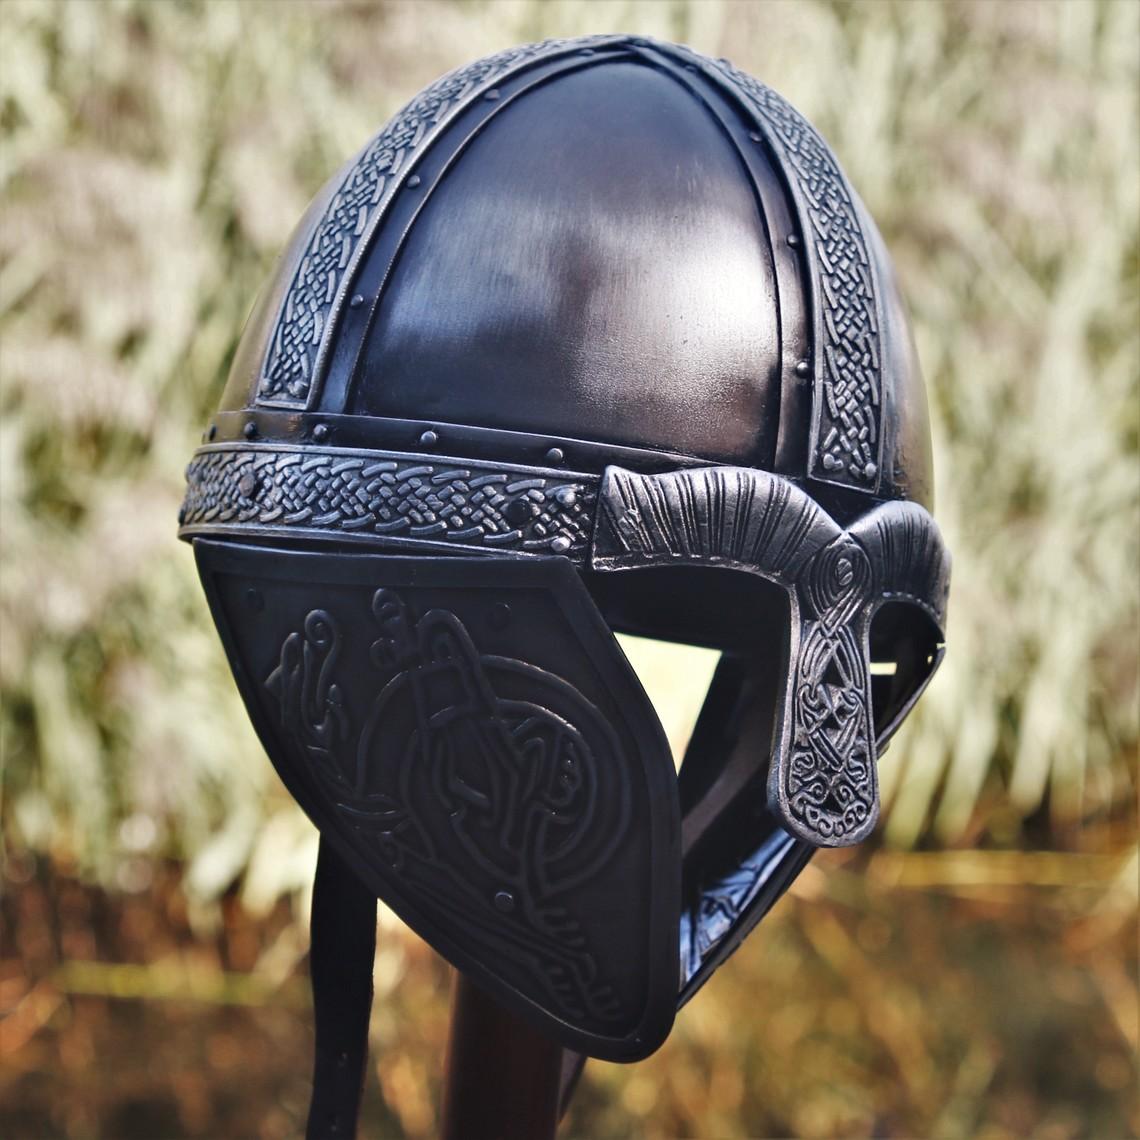 Windlass Steelcrafts Viking helmet with dragons